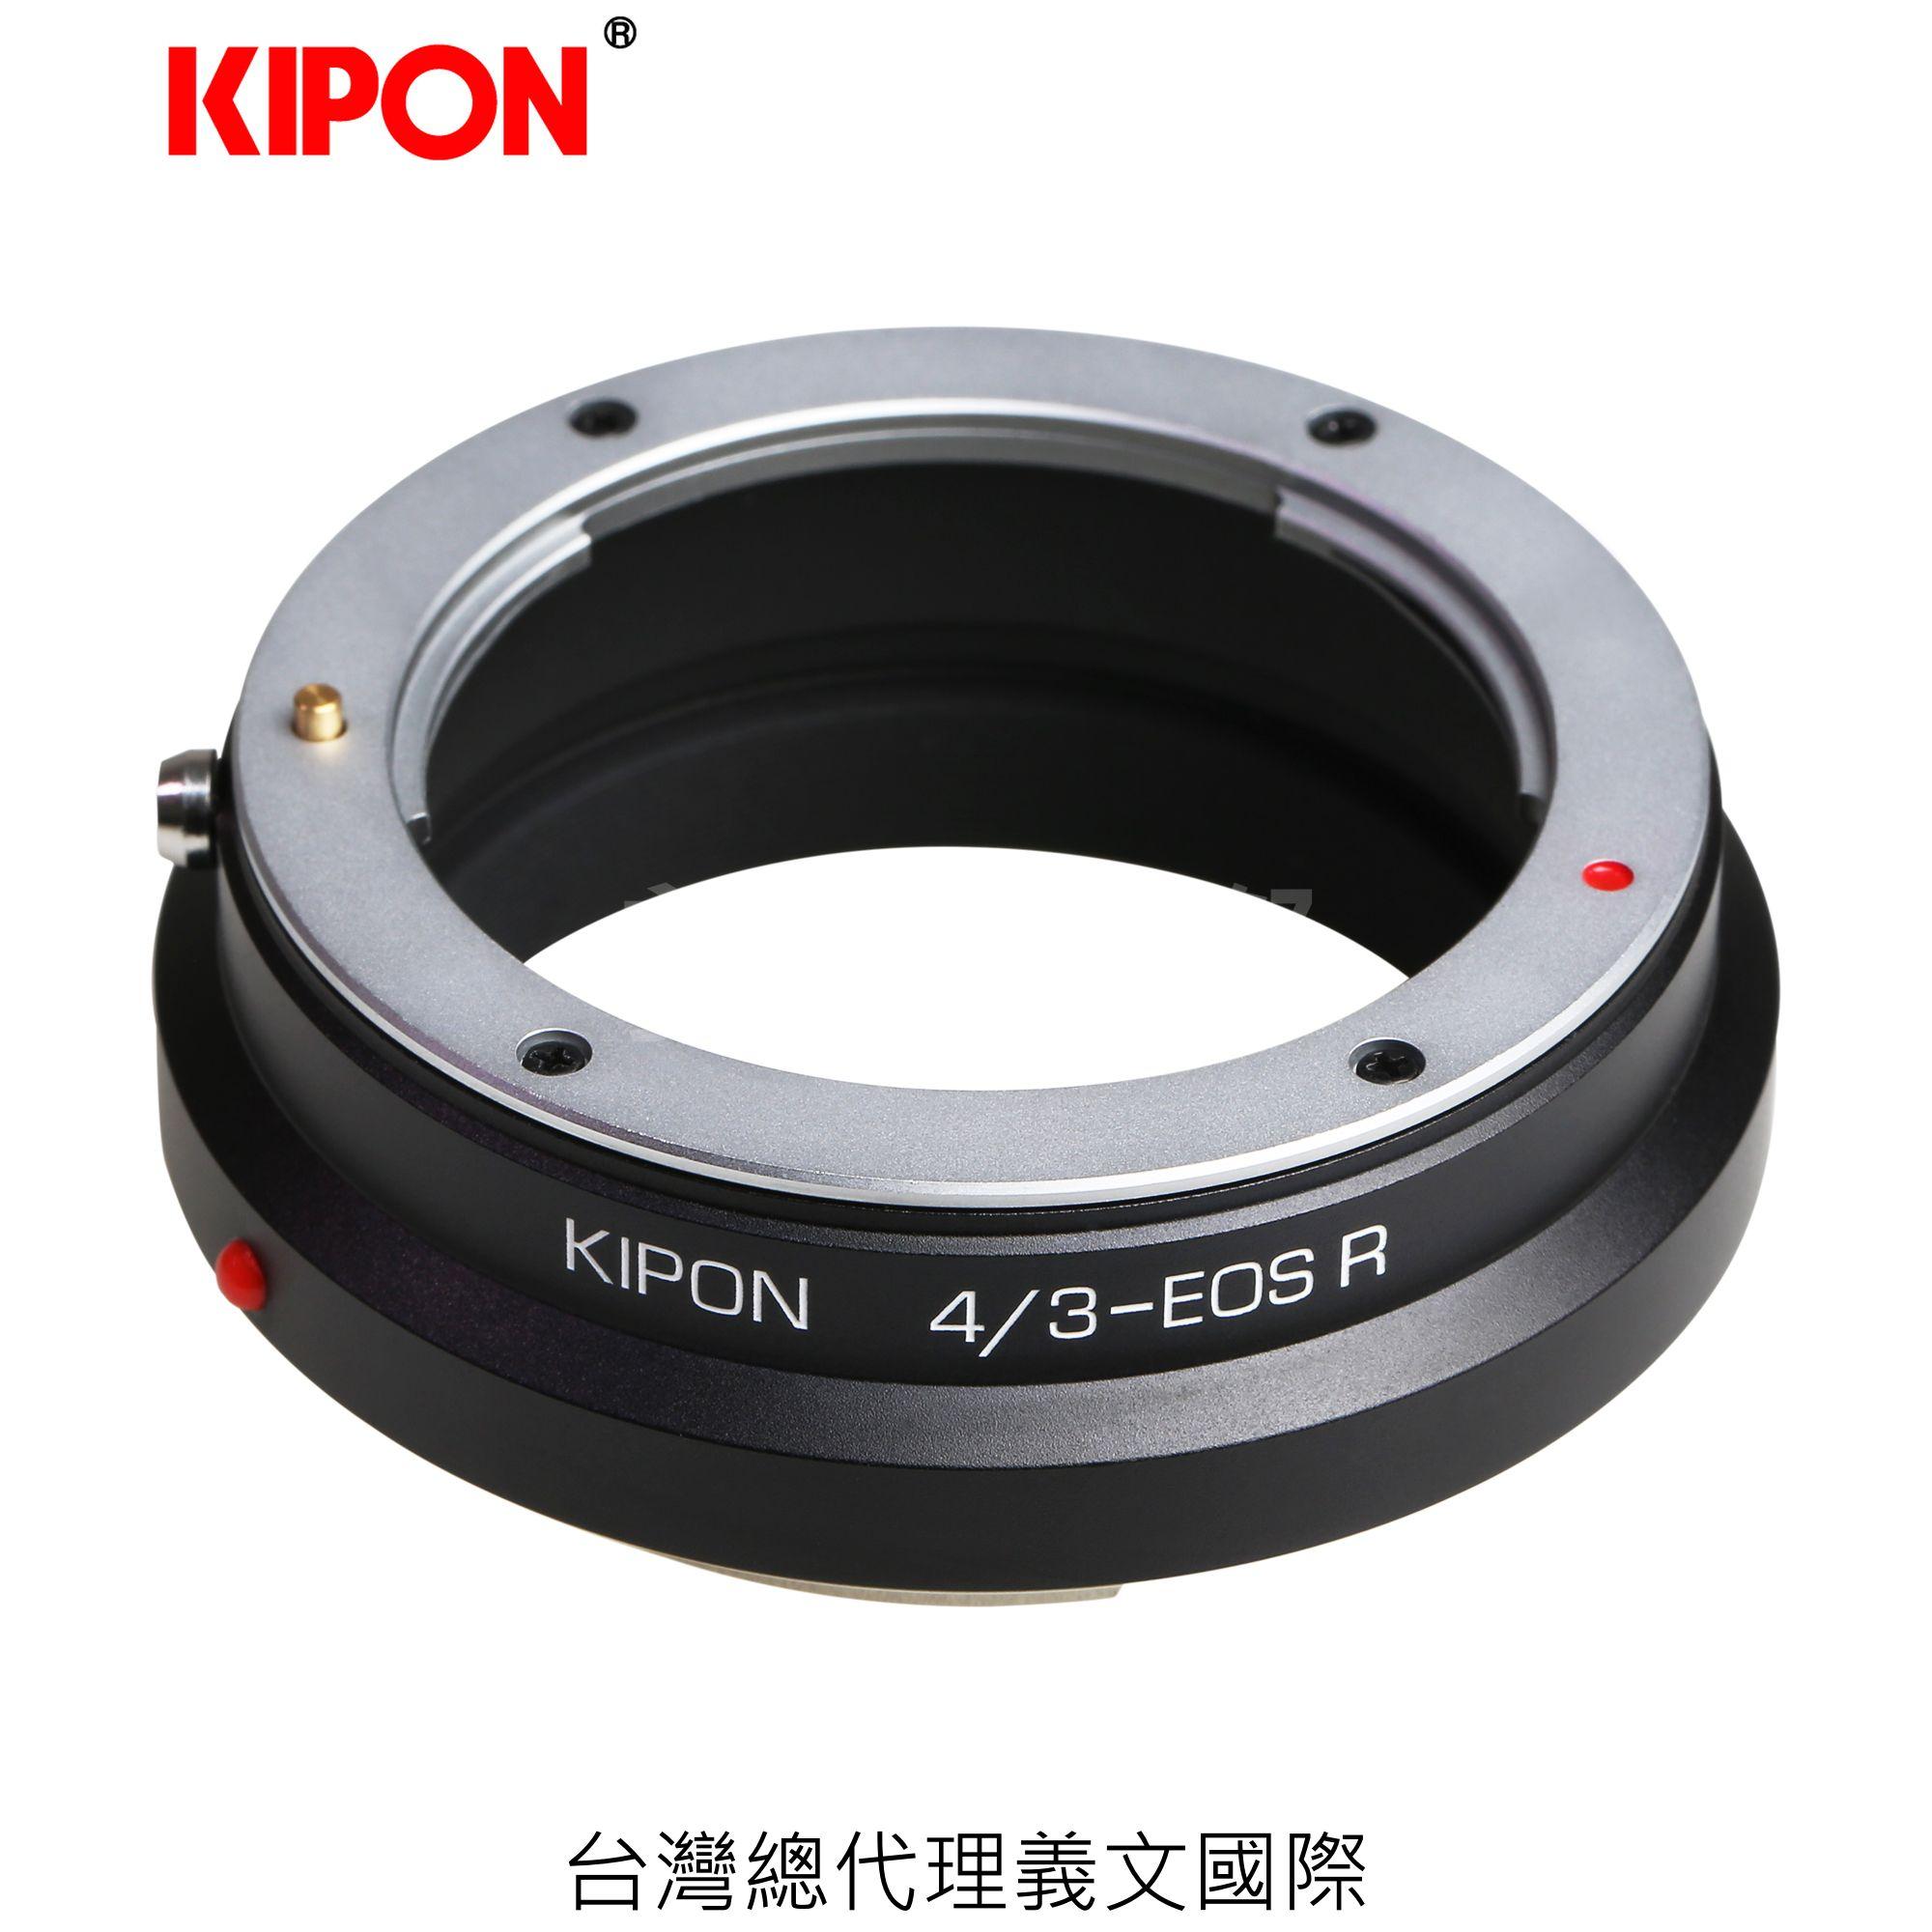 Kipon轉接環專賣店:4/3-EOS R(CANON EOS R,EFR,佳能,EOS RP)